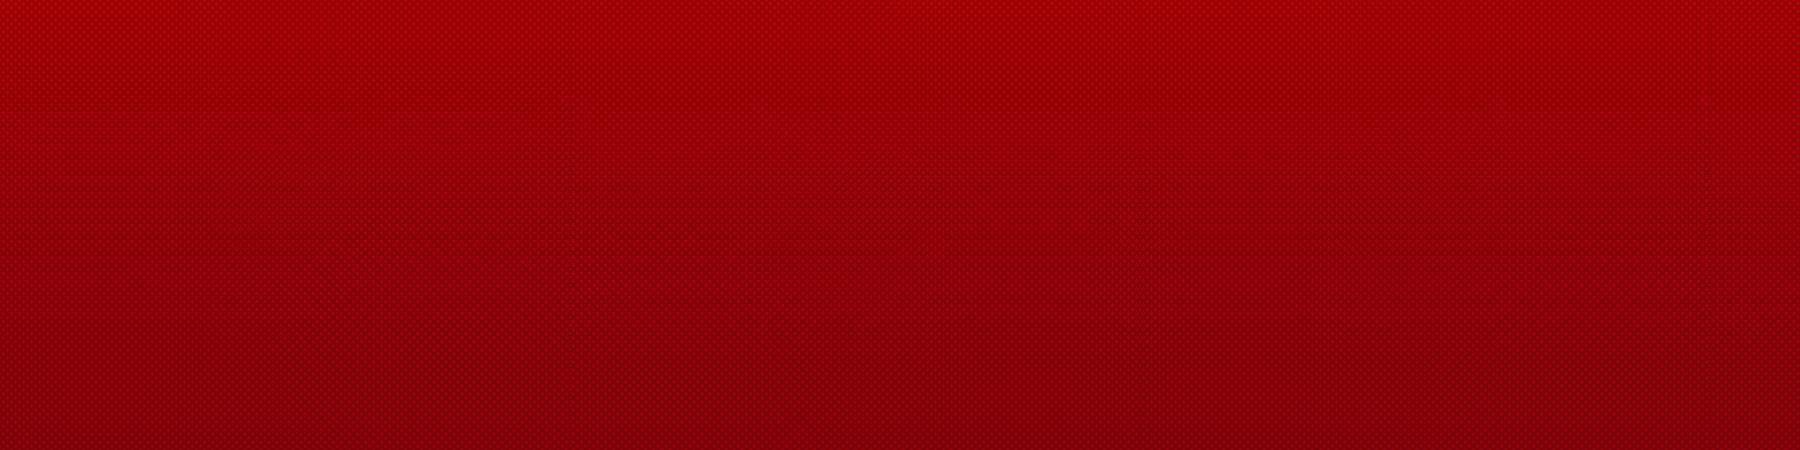 background_fullwidth_elektro